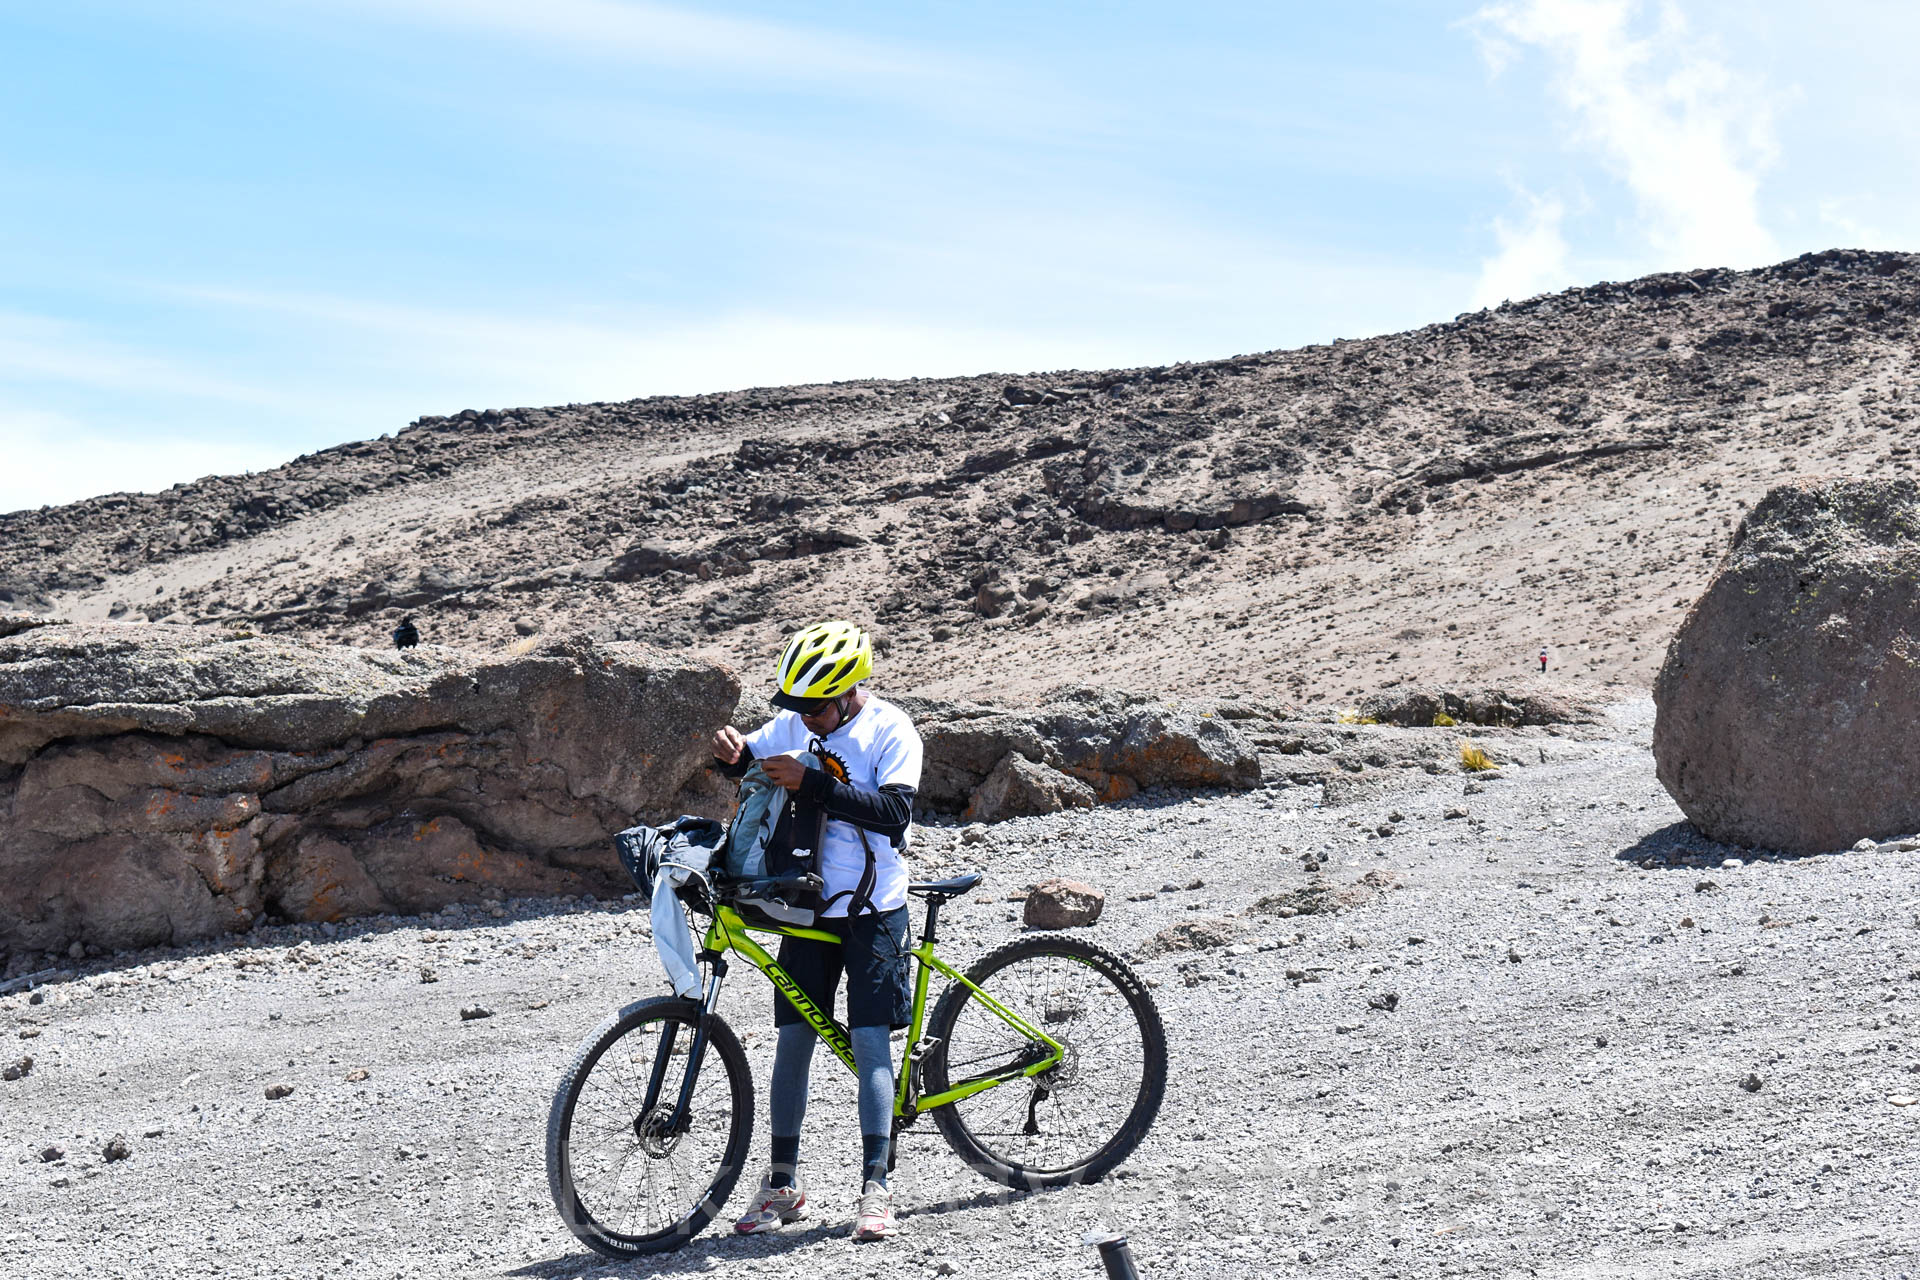 Kilimanjaro-bike-and-cycling-tour (45)